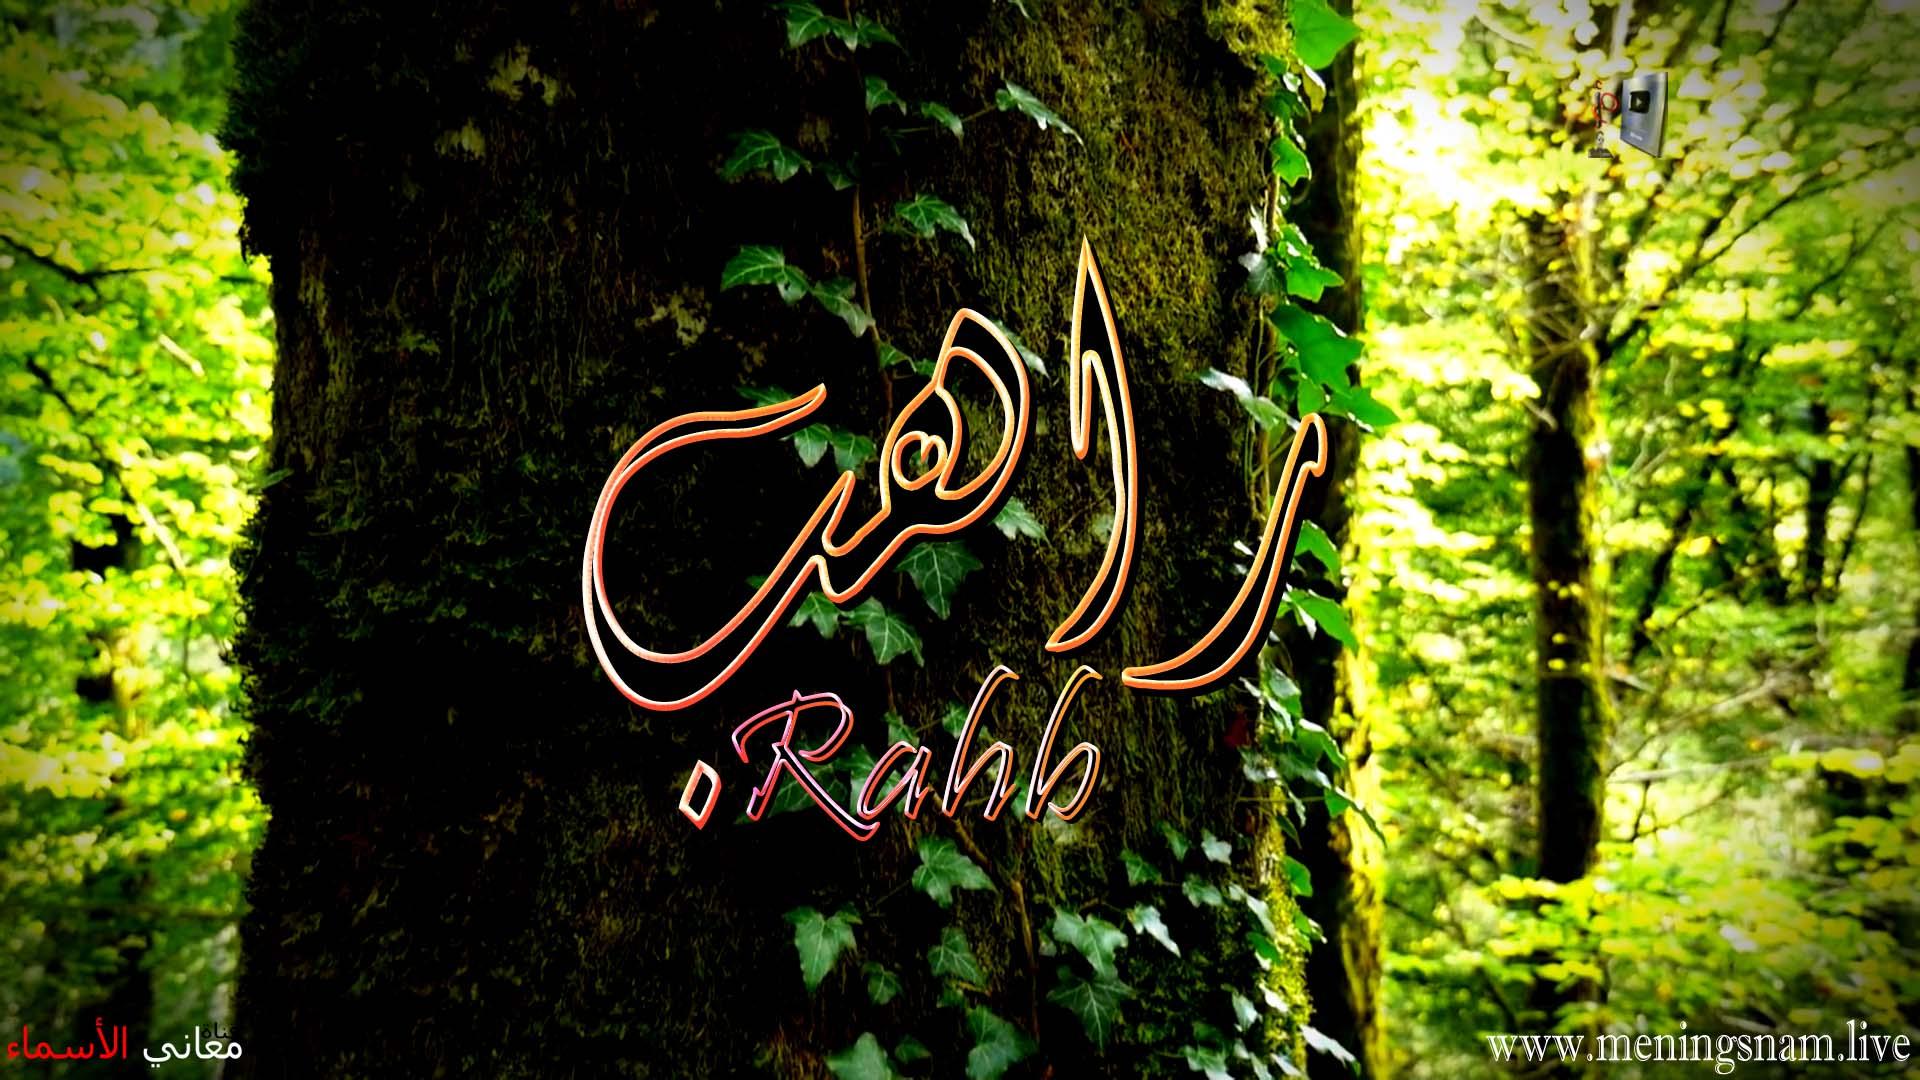 معنى اسم راهب وصفات حامل هذا الاسم Rahb